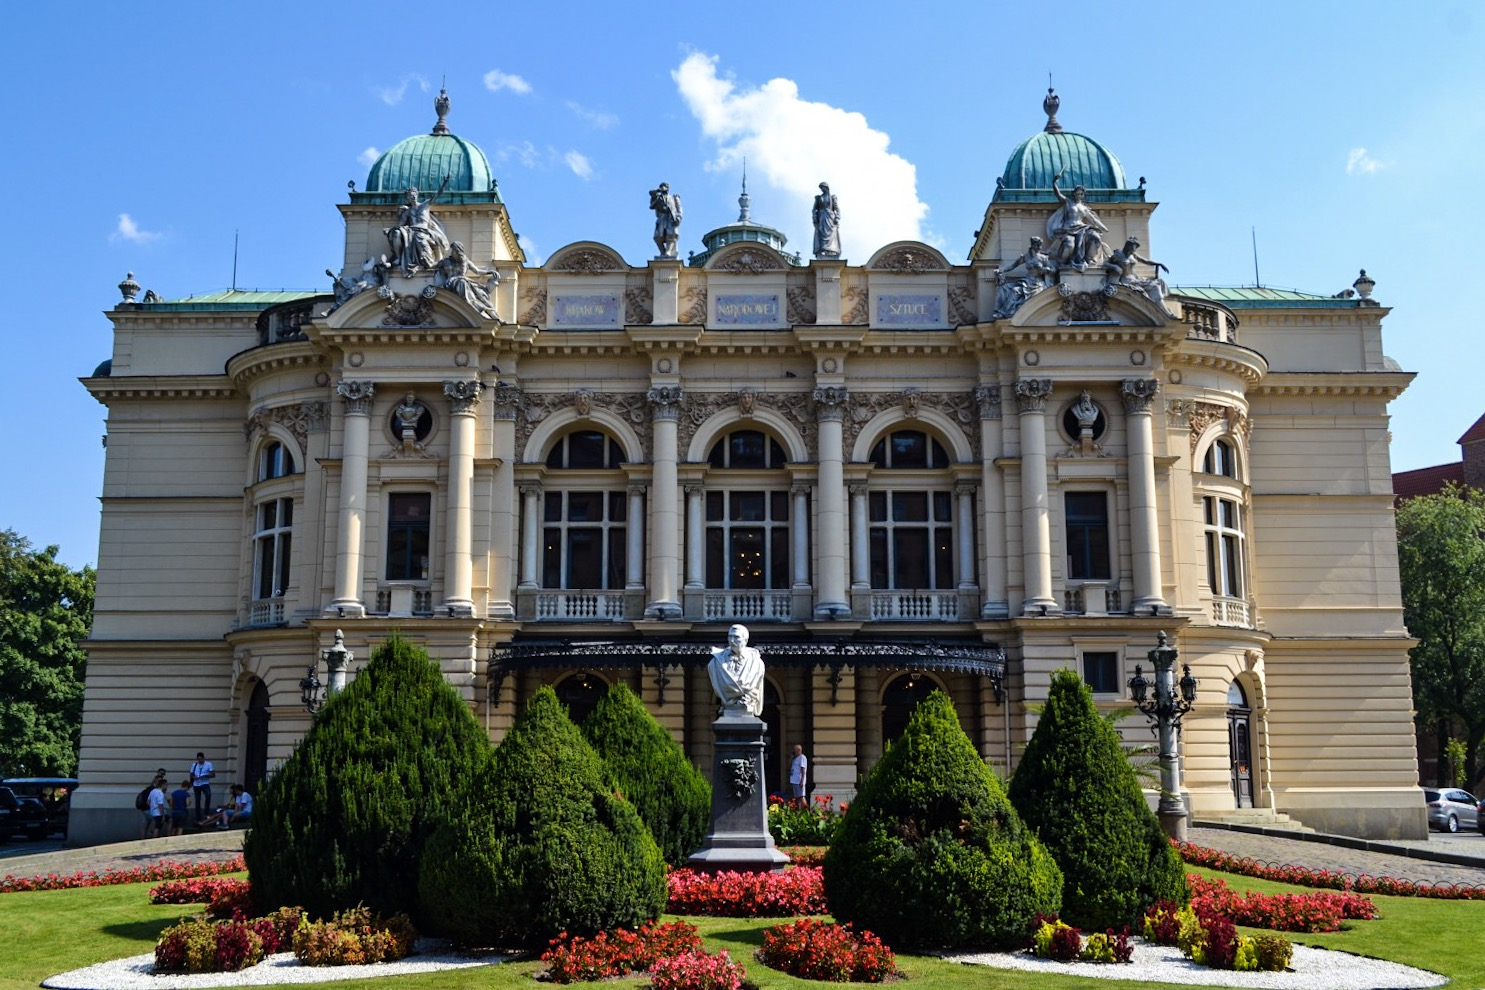 Słowacki Theater in Krakow